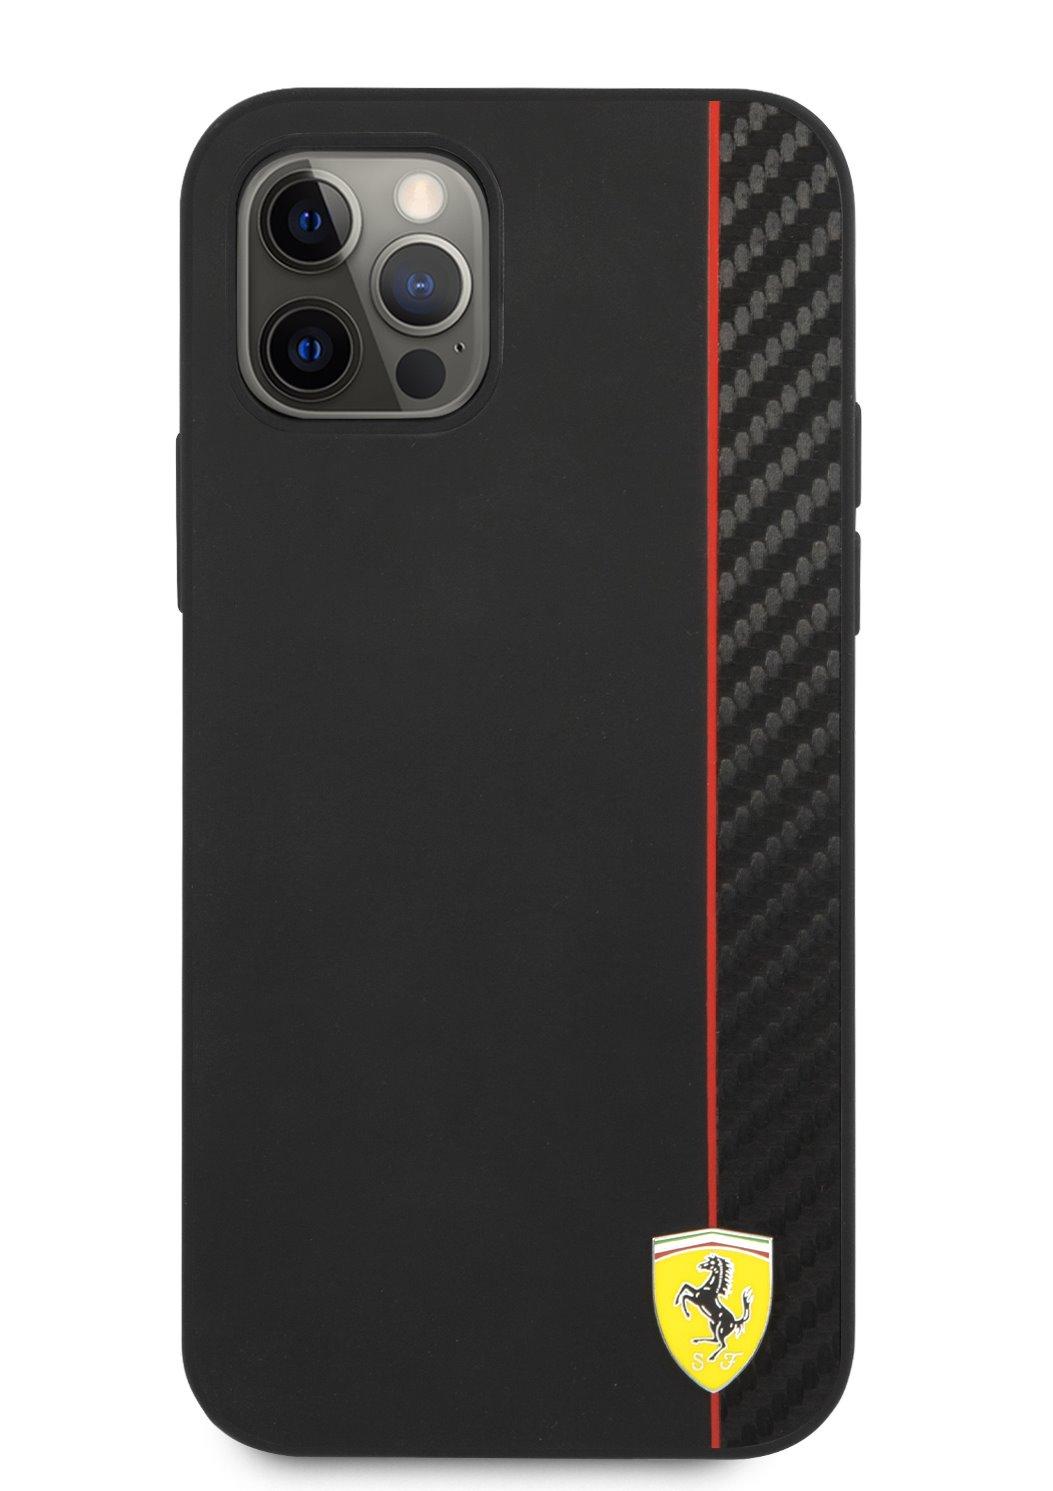 FESAXHCP12MBK Ferrari On Track Stripe Carbon Zadní Kryt pro iPhone 12/12 Pro 6.1 Black 3700740499436